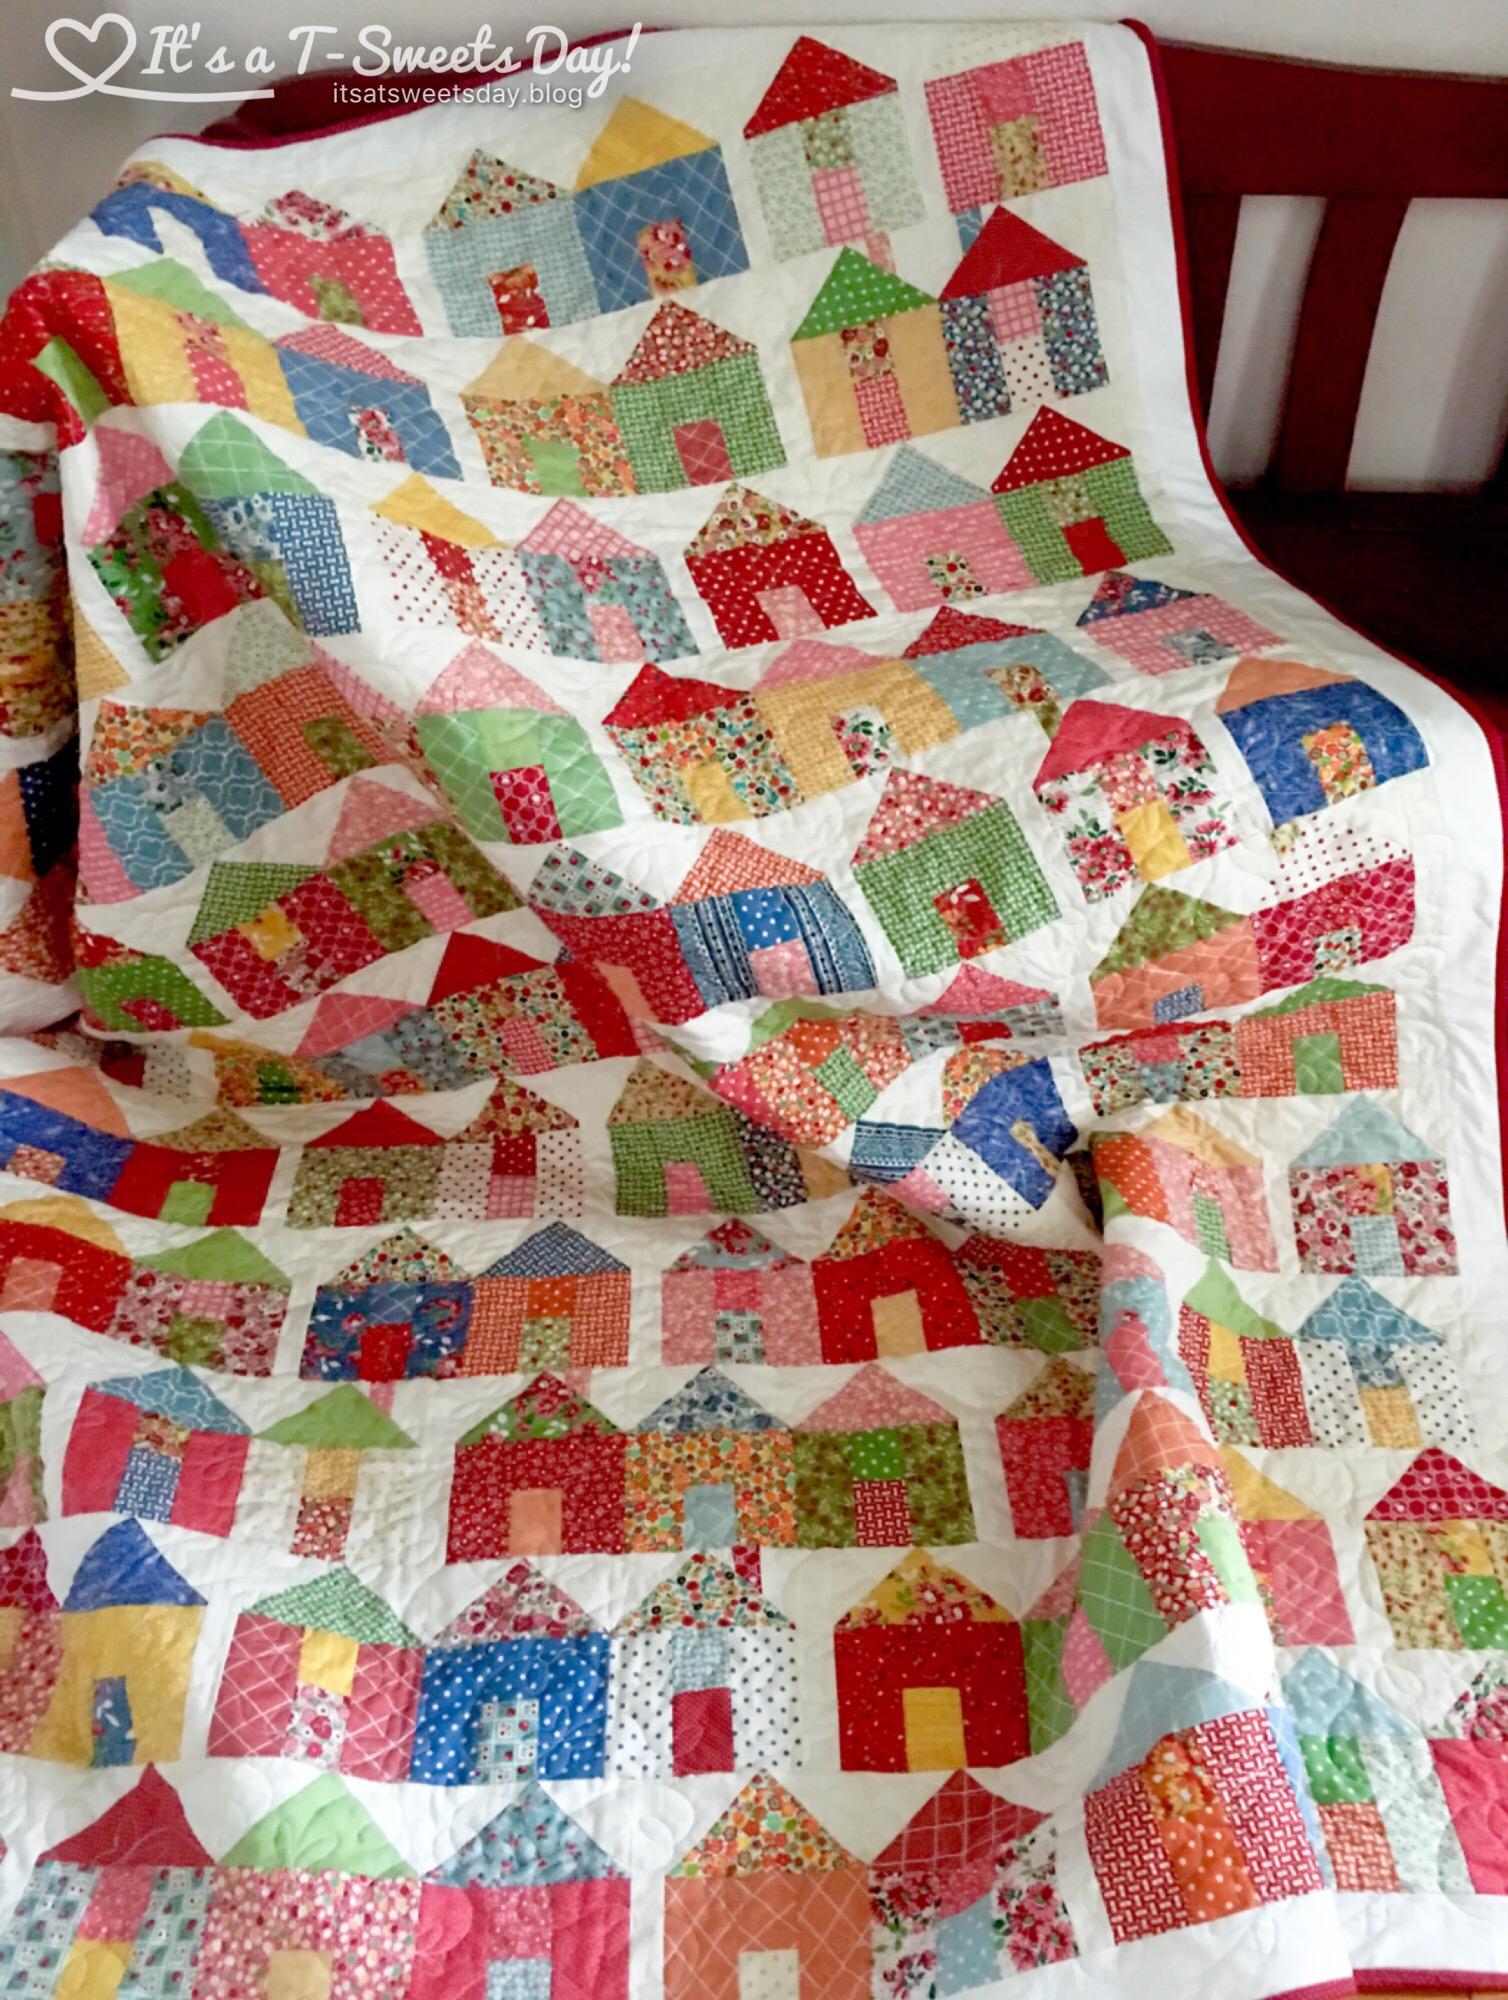 Village Quilt – It's a T-Sweets day! : village quilt - Adamdwight.com